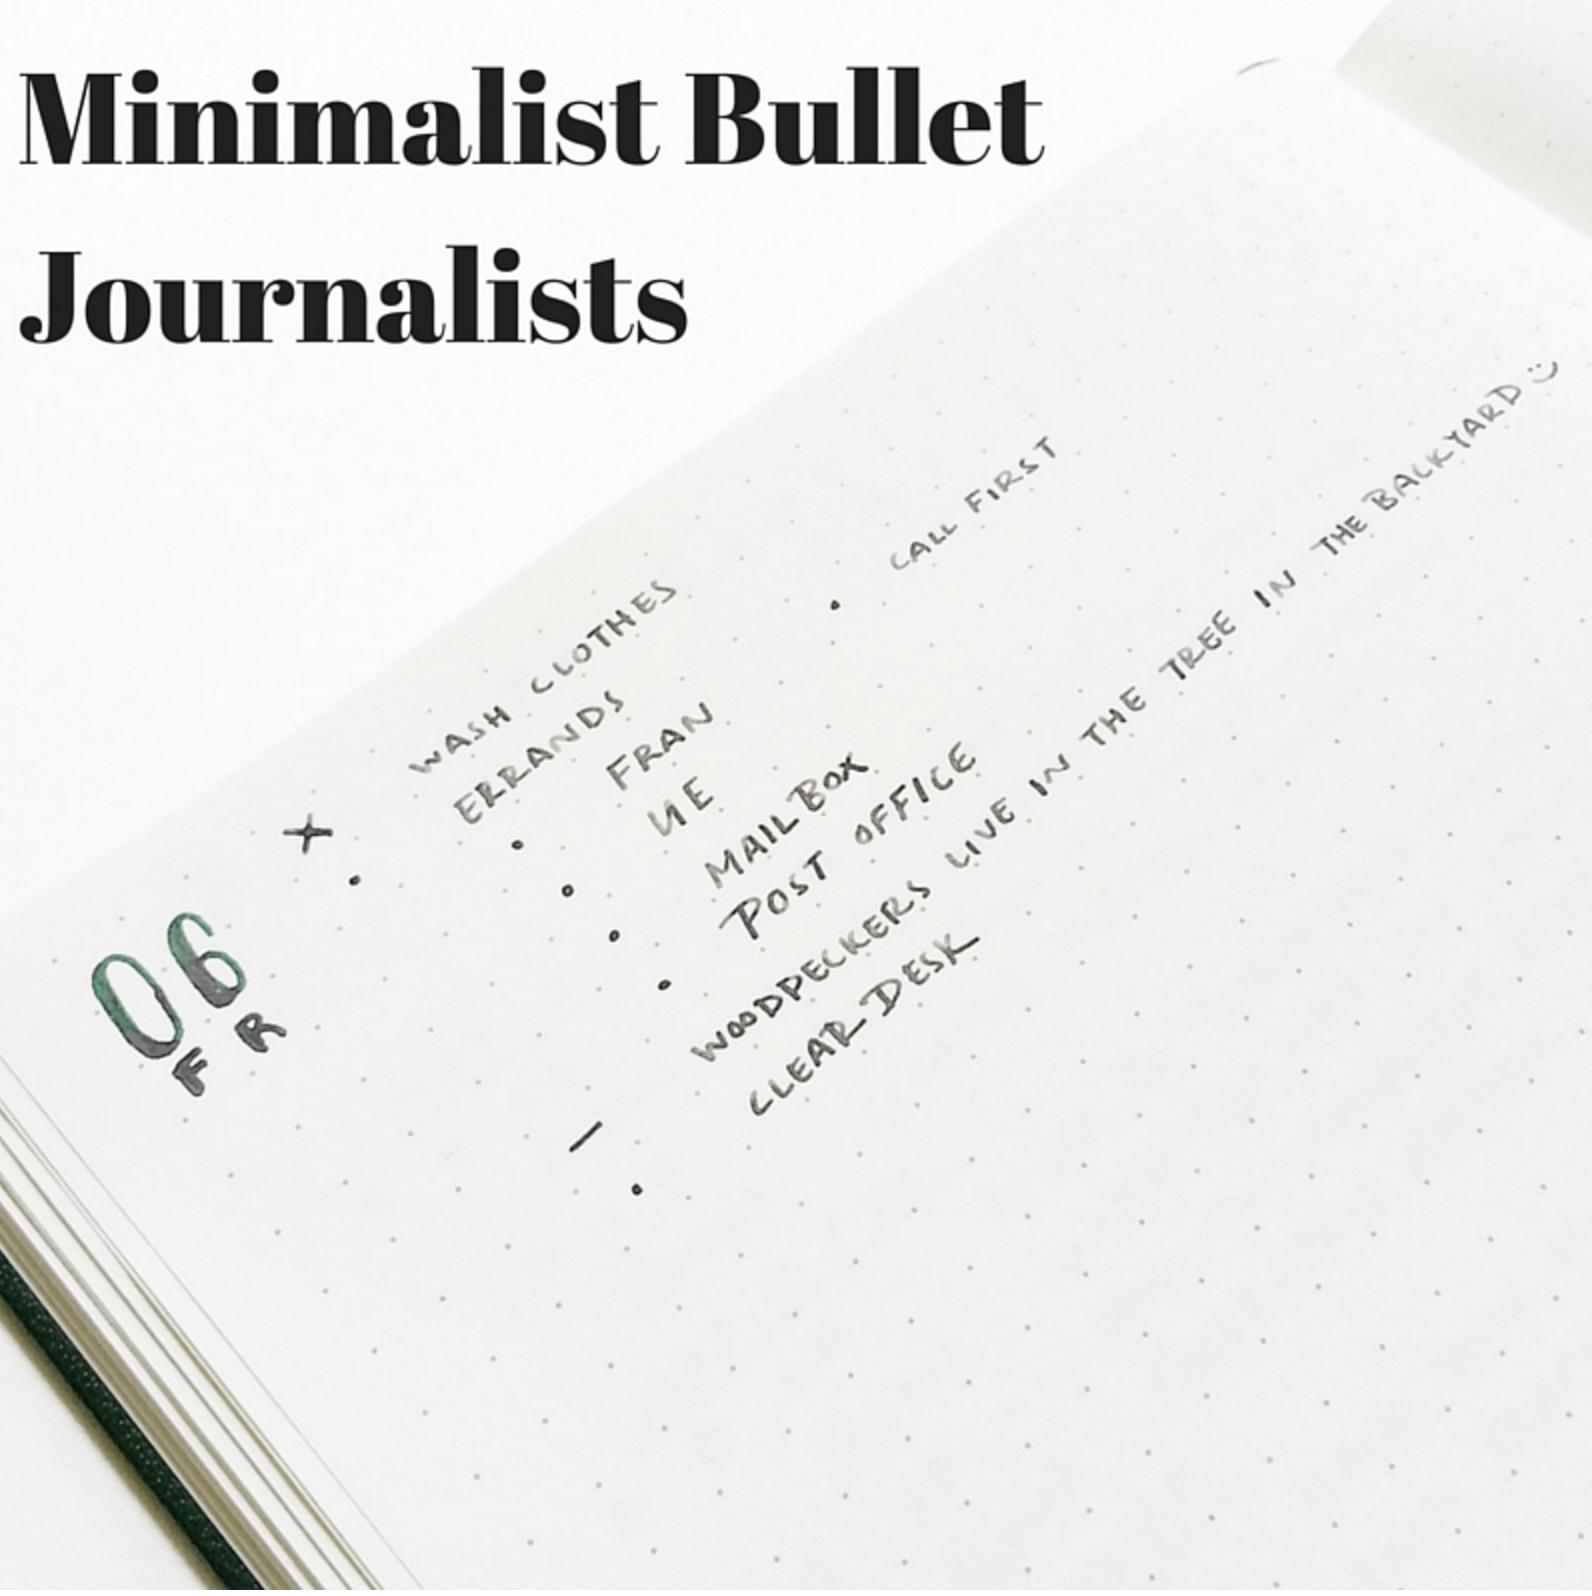 M  inimalist Bullet Journalists